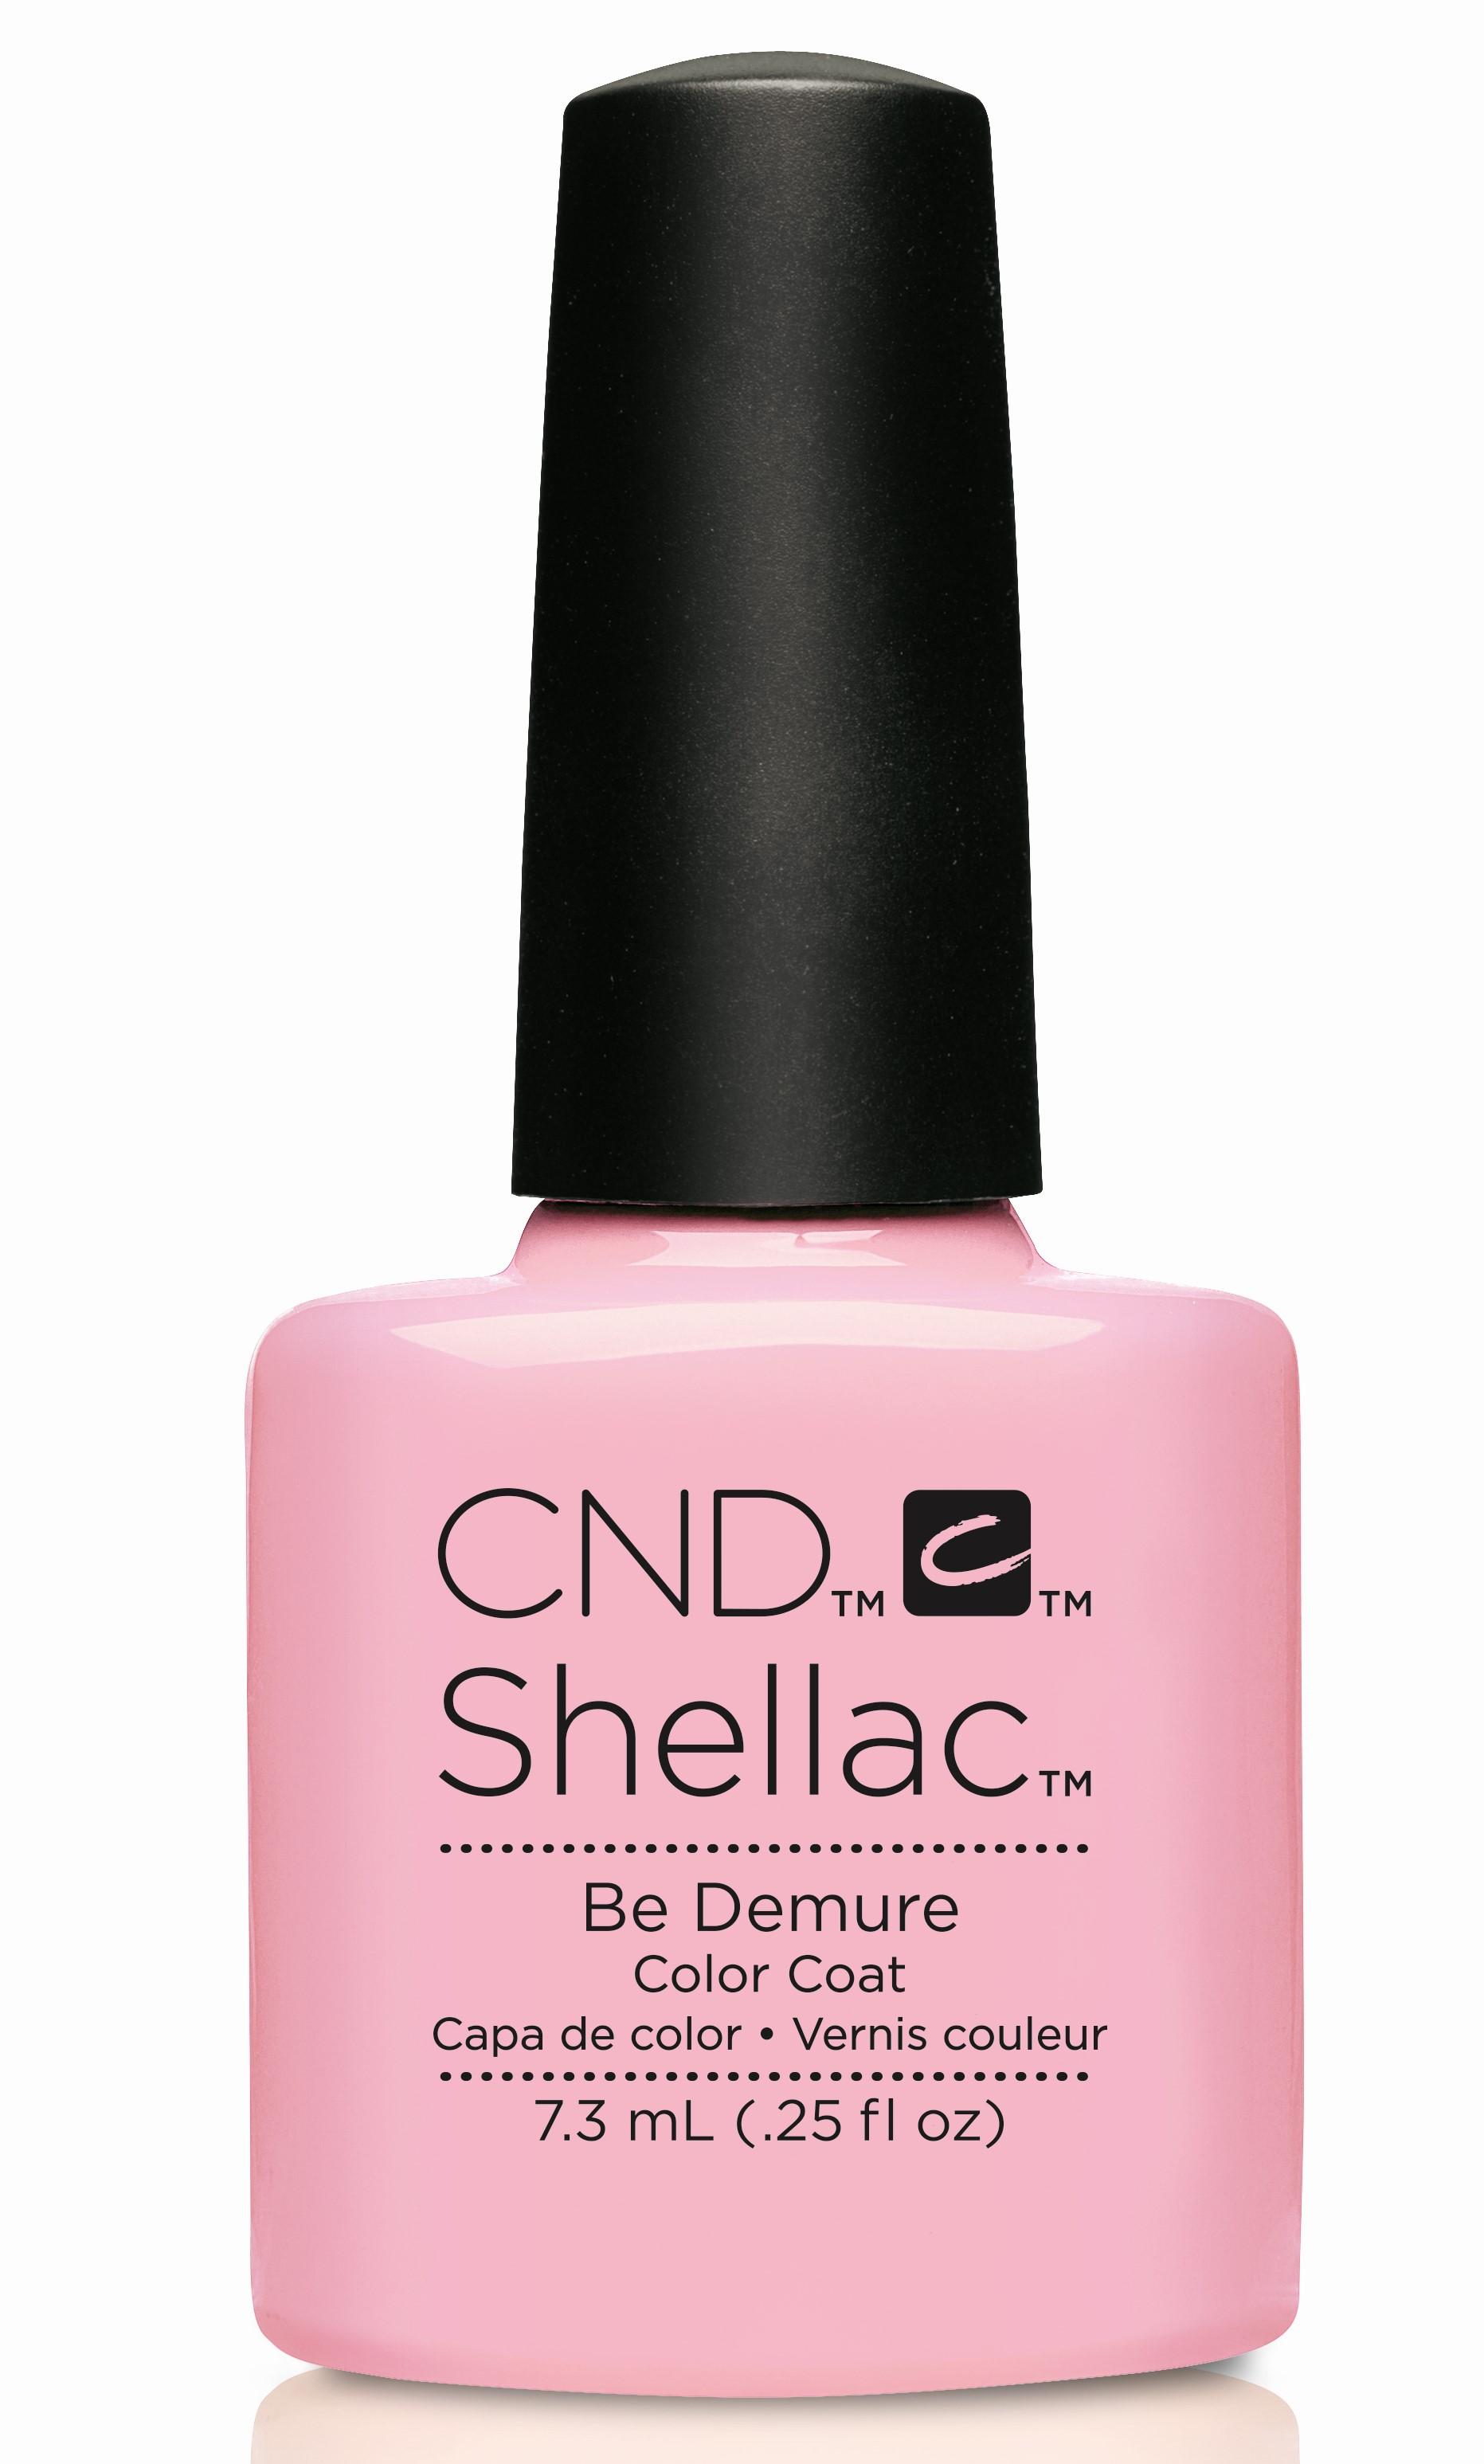 CND 91173 покрытие гелевое Be Demure / SHELLAC Flirtations 7,3мл cnd 083 покрытие гелевое bare chemise shellac 7 3мл